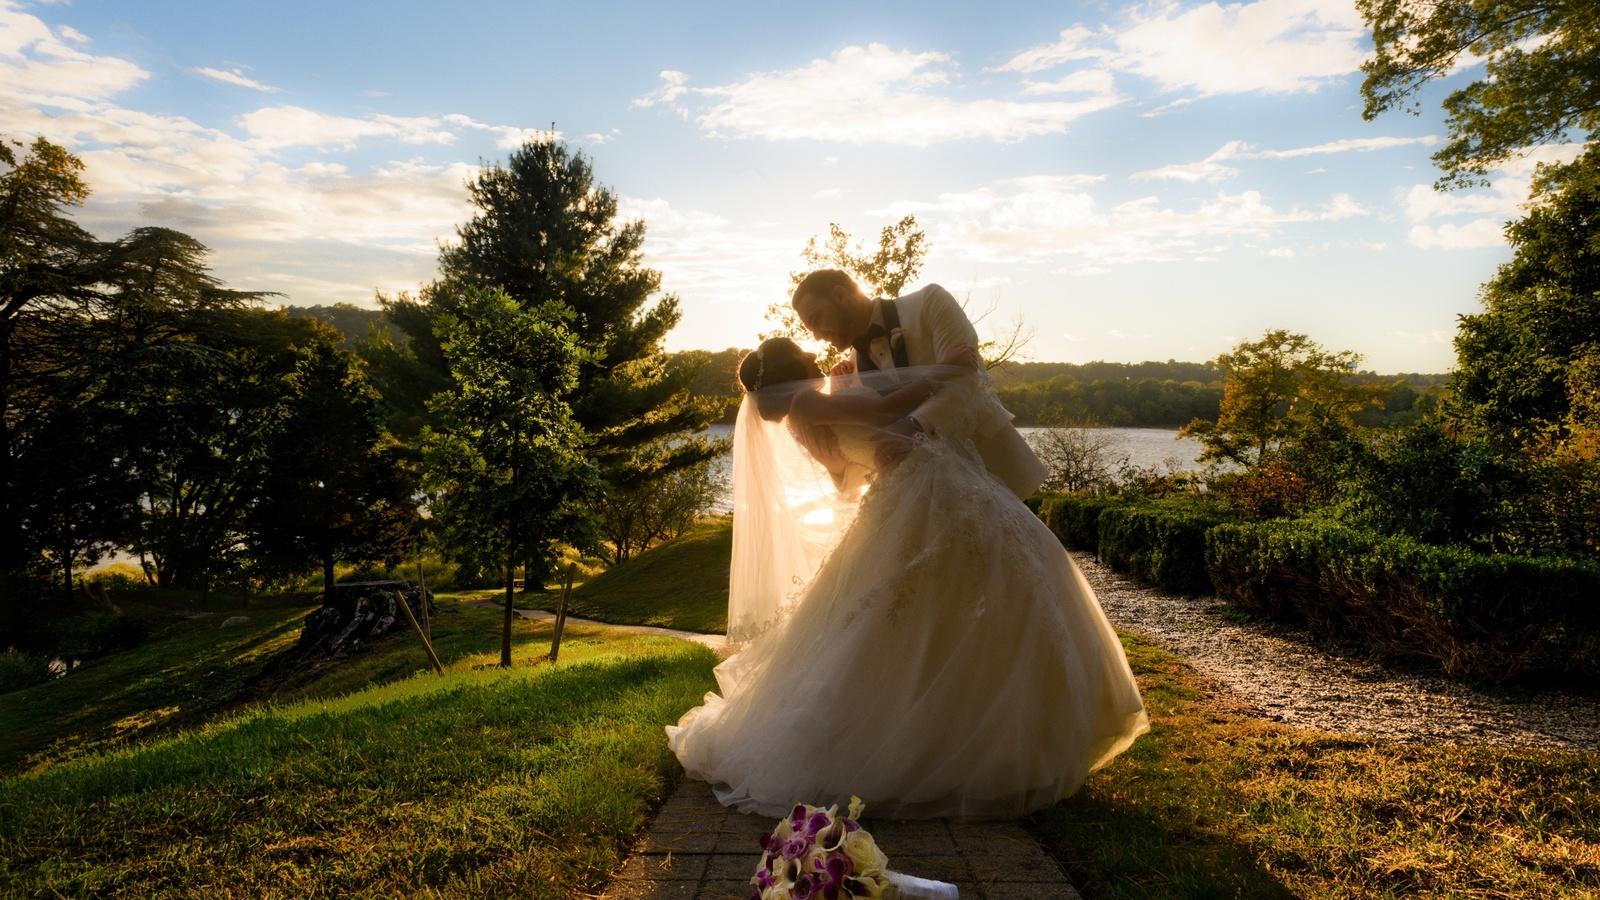 пара, свадьба, любовь